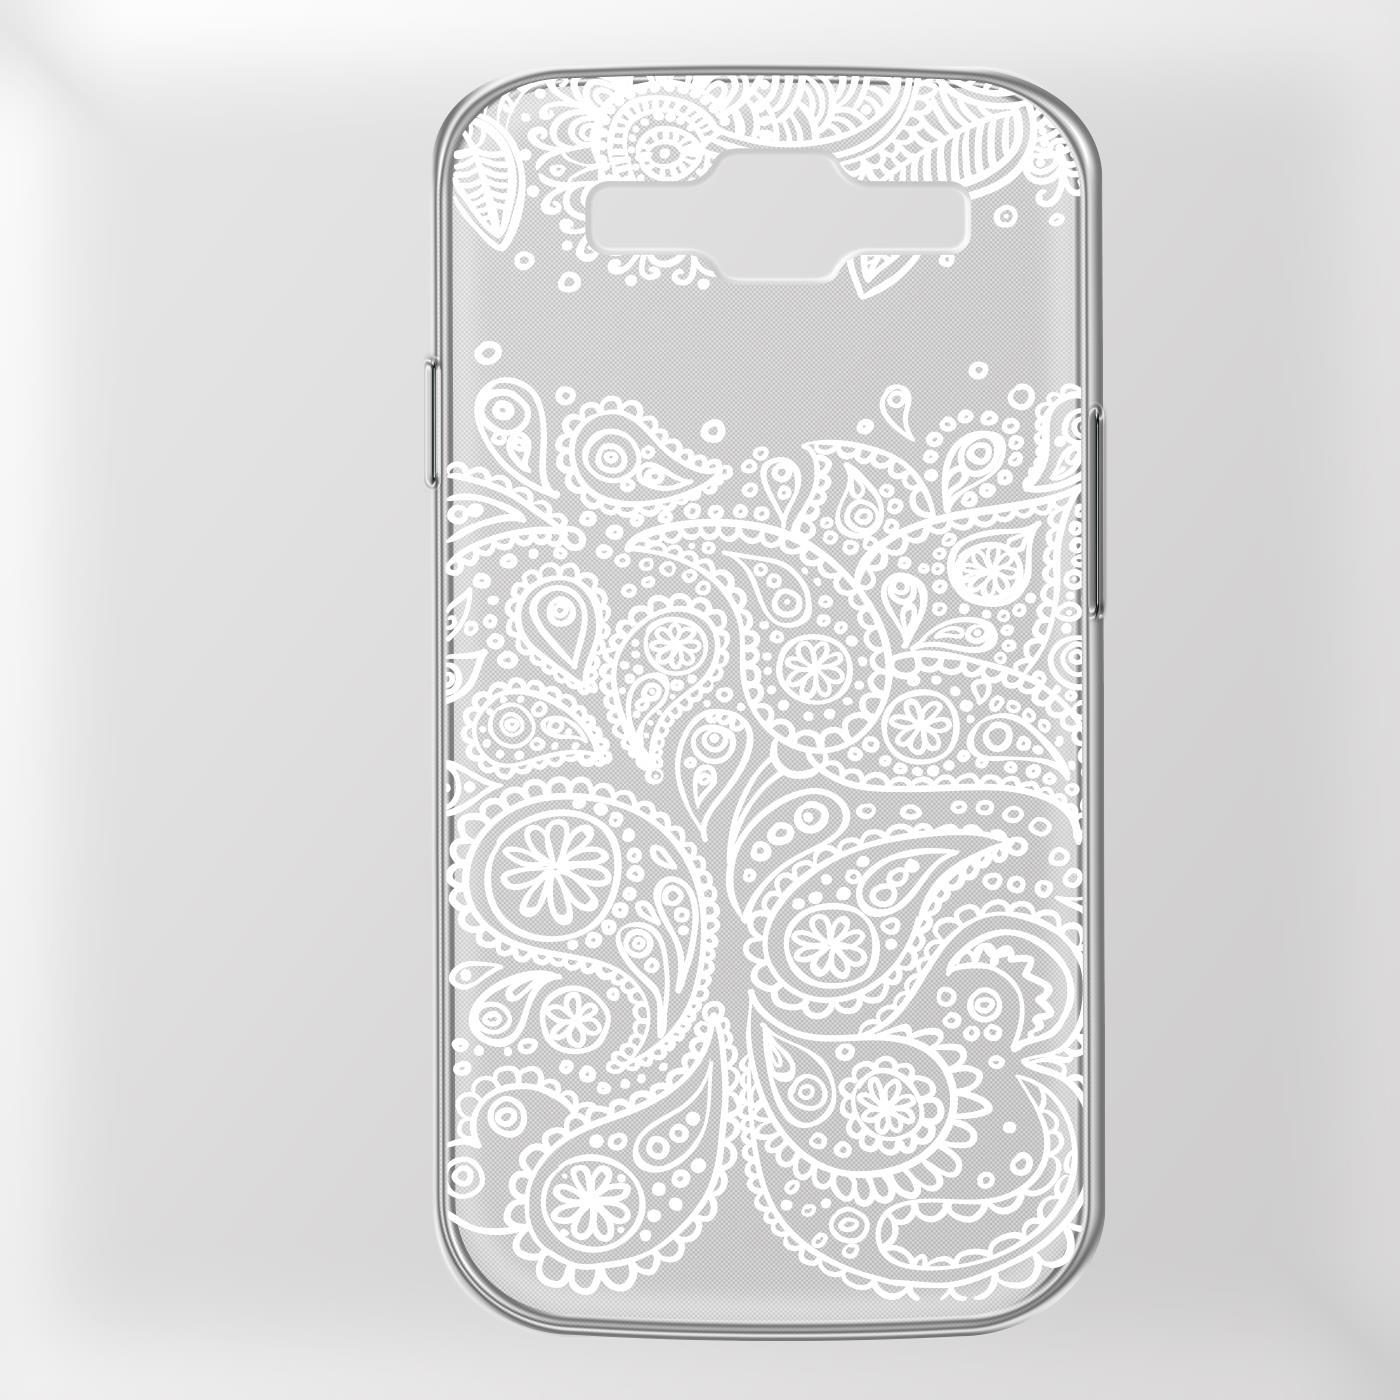 Samsung-Galaxy-S3-Neo-Handy-Schutz-Huelle-Case-TPU-Silikon-Cover-Tasche-Mandala Indexbild 25